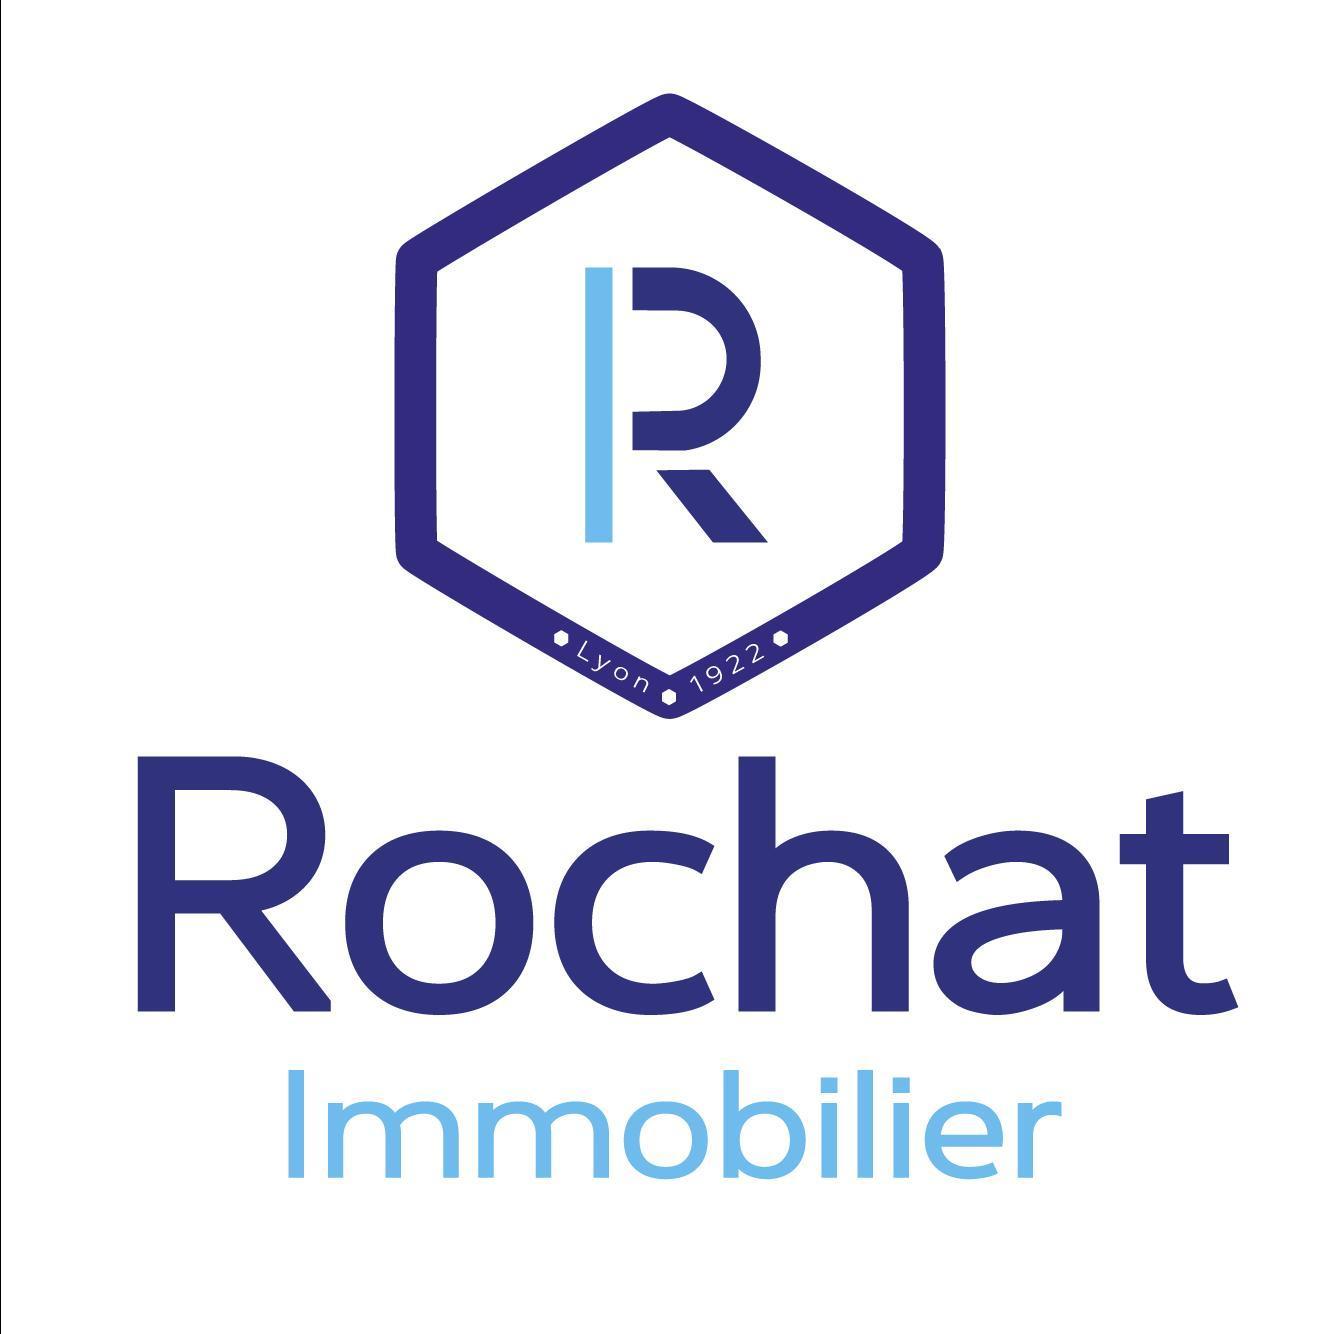 Rochat Immobilier agence immobilière Lyon 69002